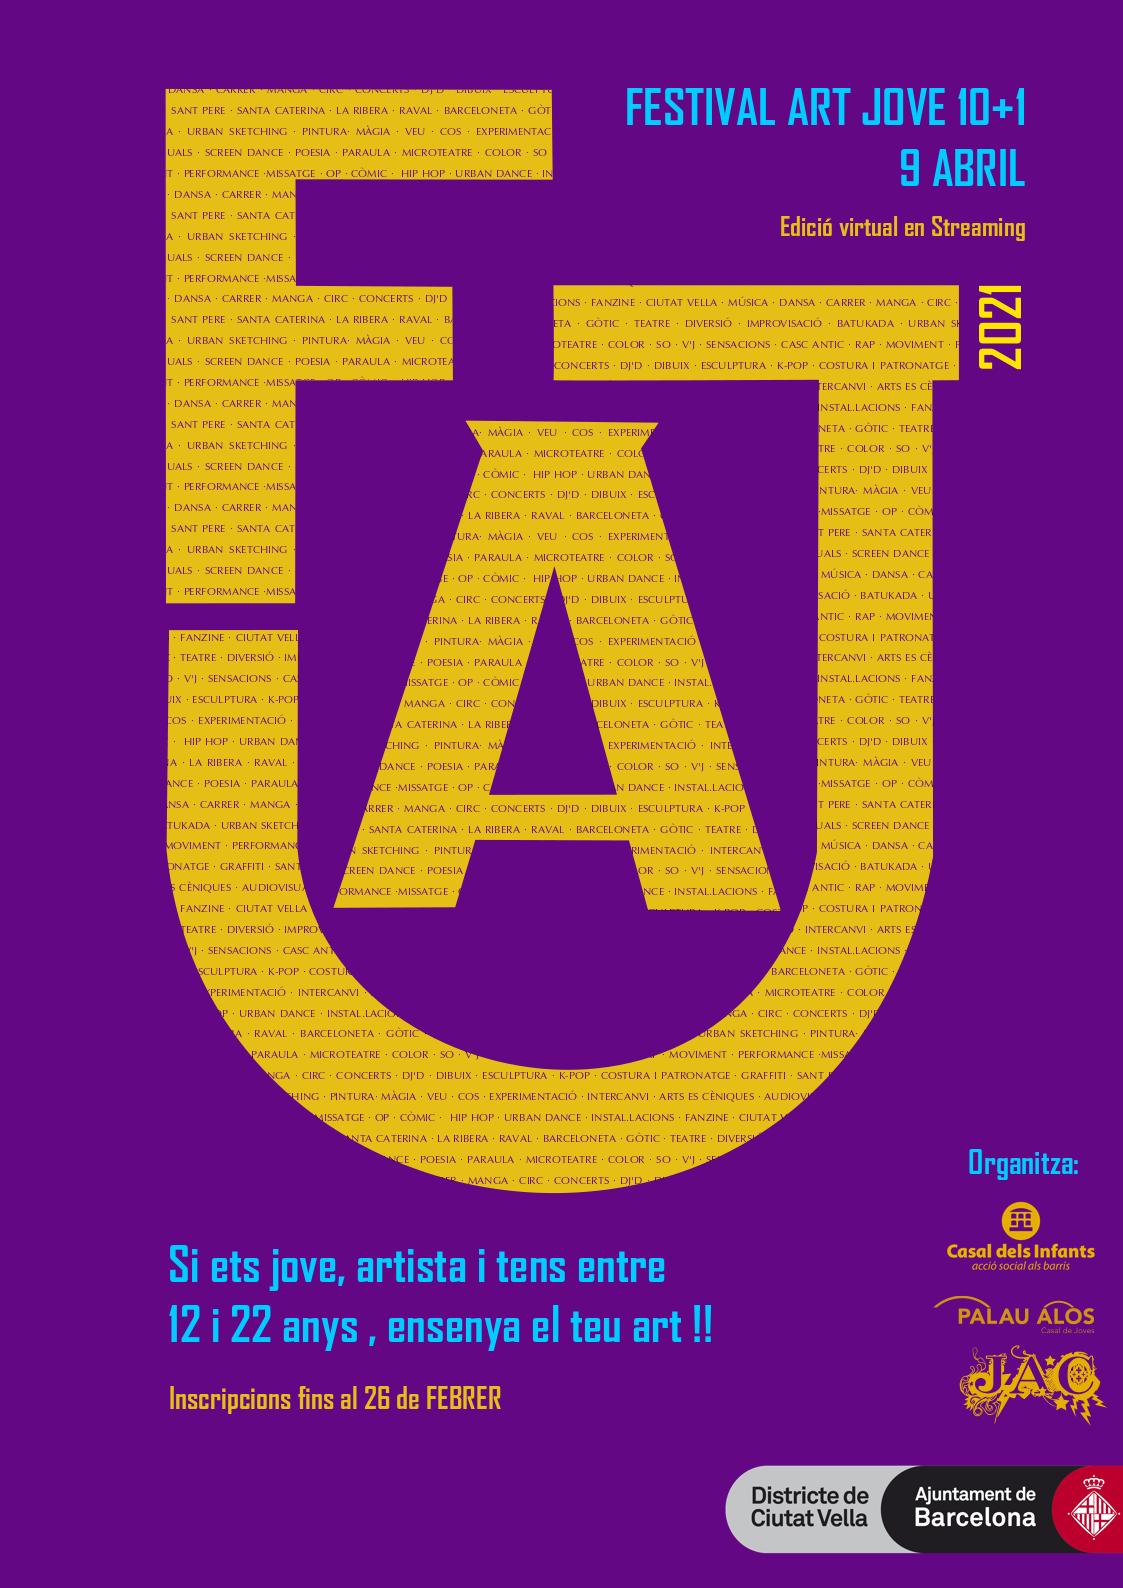 Festival Art Jove 2021